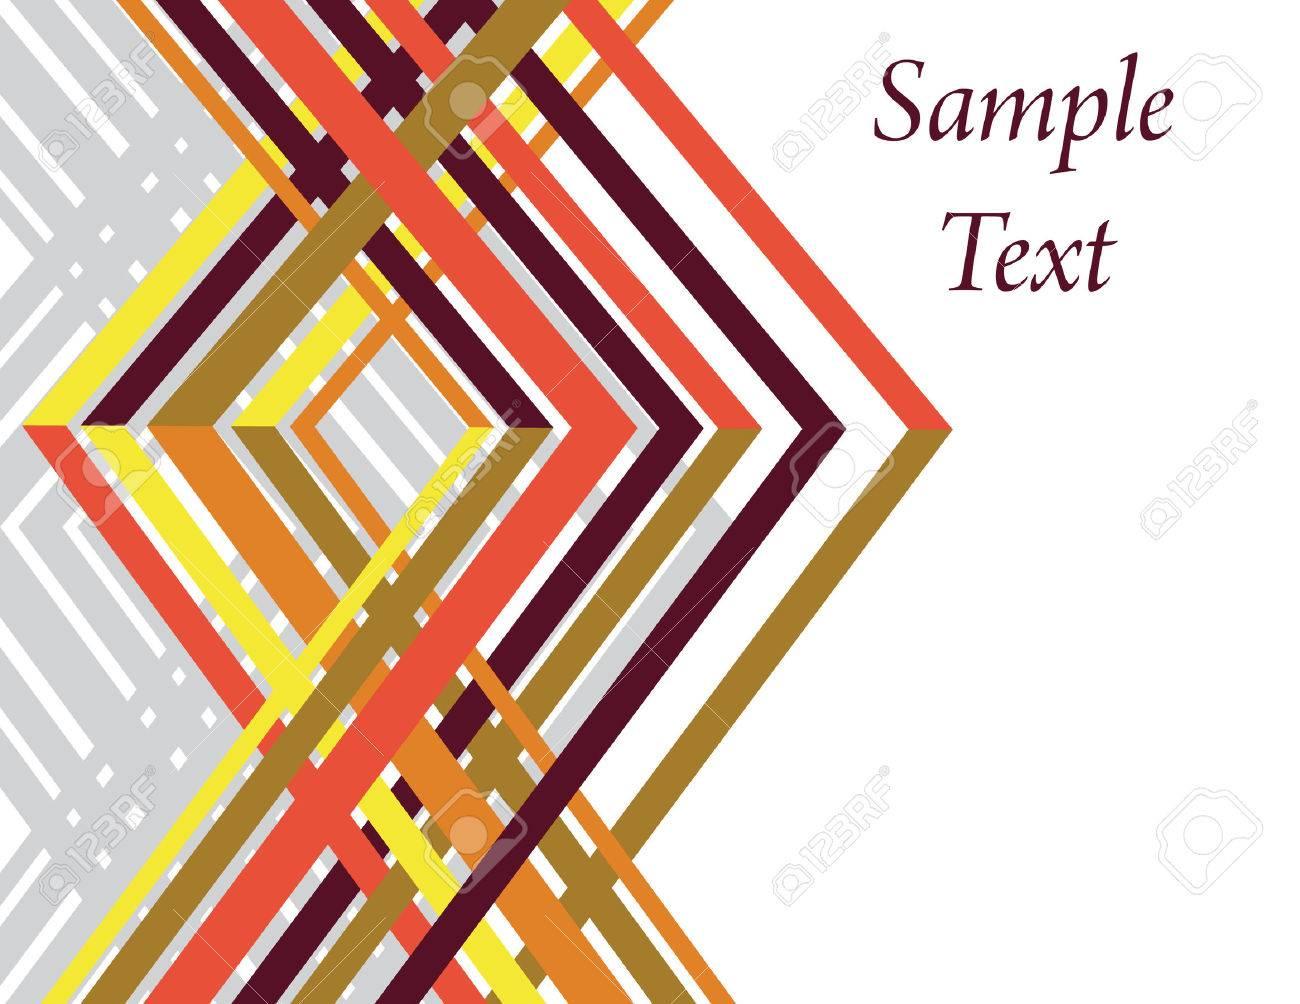 Geometric Weave Stock Vector - 6565067